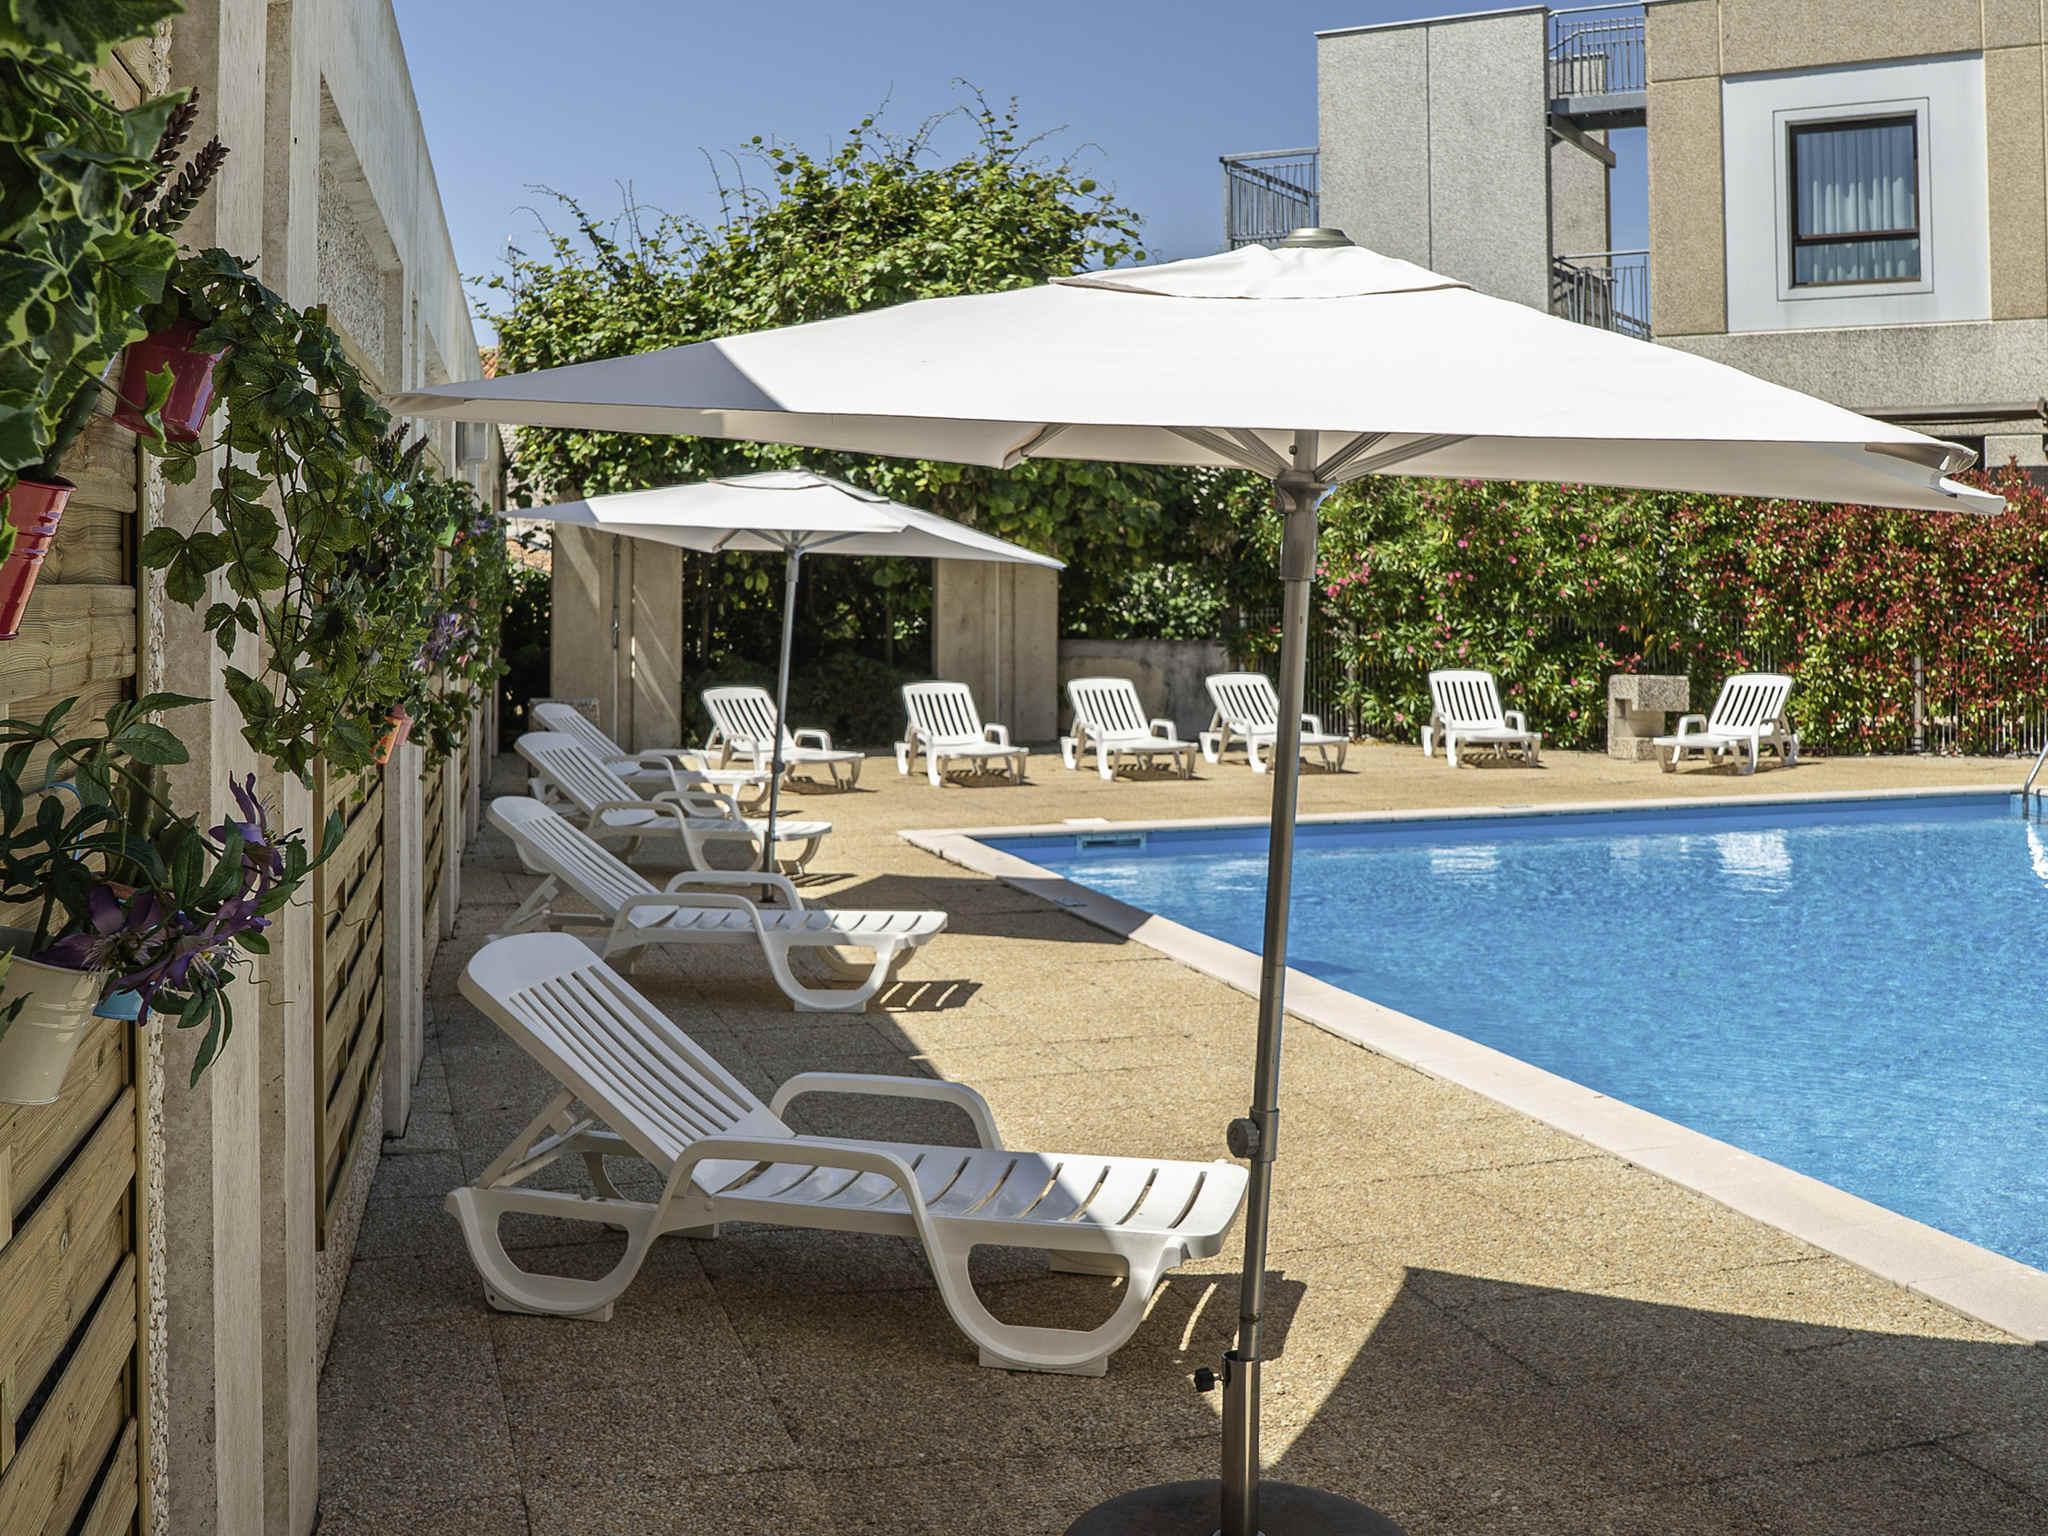 فندق - Hôtel Mercure Niort Marais Poitevin